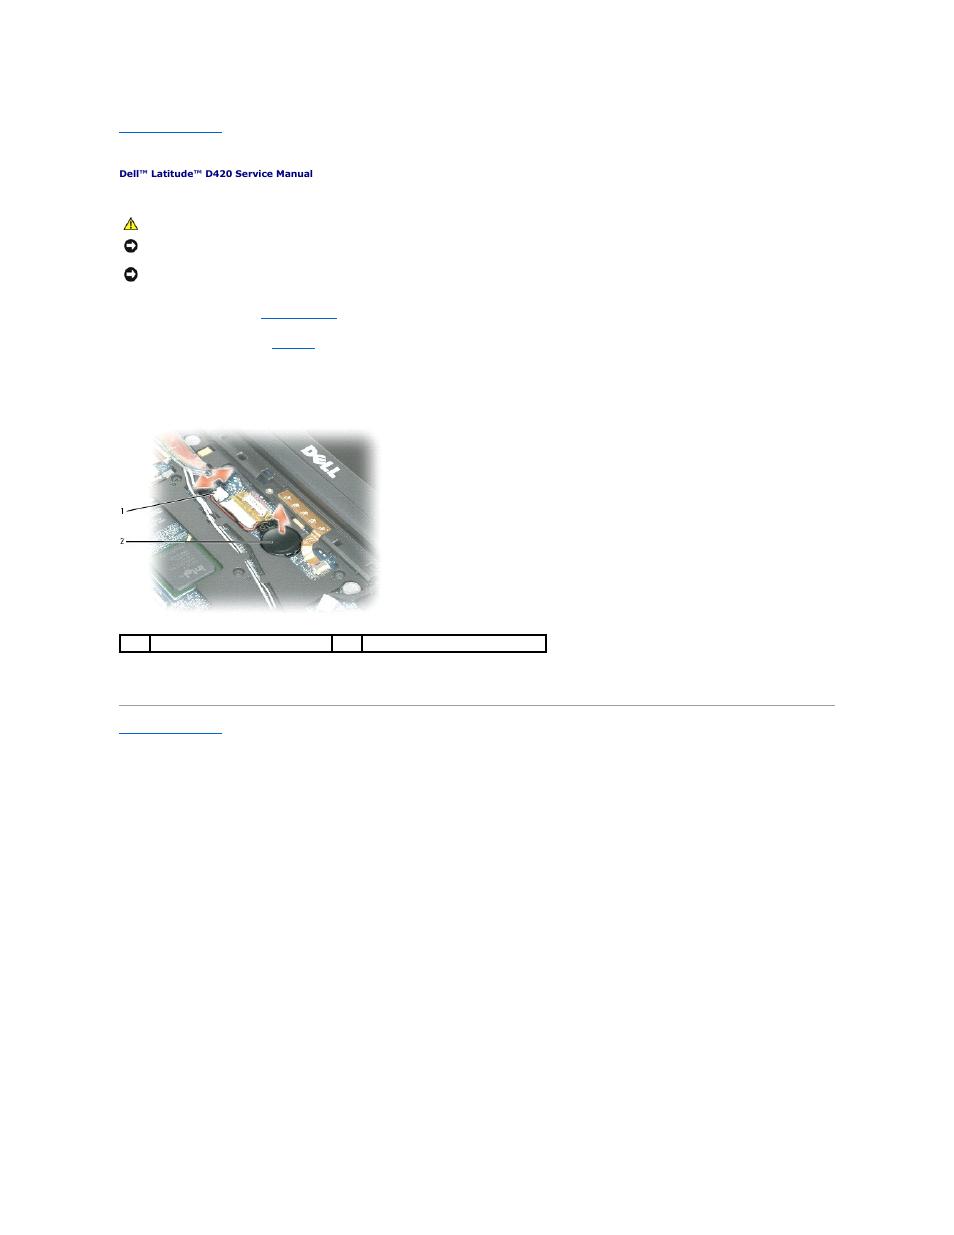 coin cell battery dell latitude d420 user manual page 8 37 rh manualsdir com dell d420 service manual pdf Latitude D420 Battery